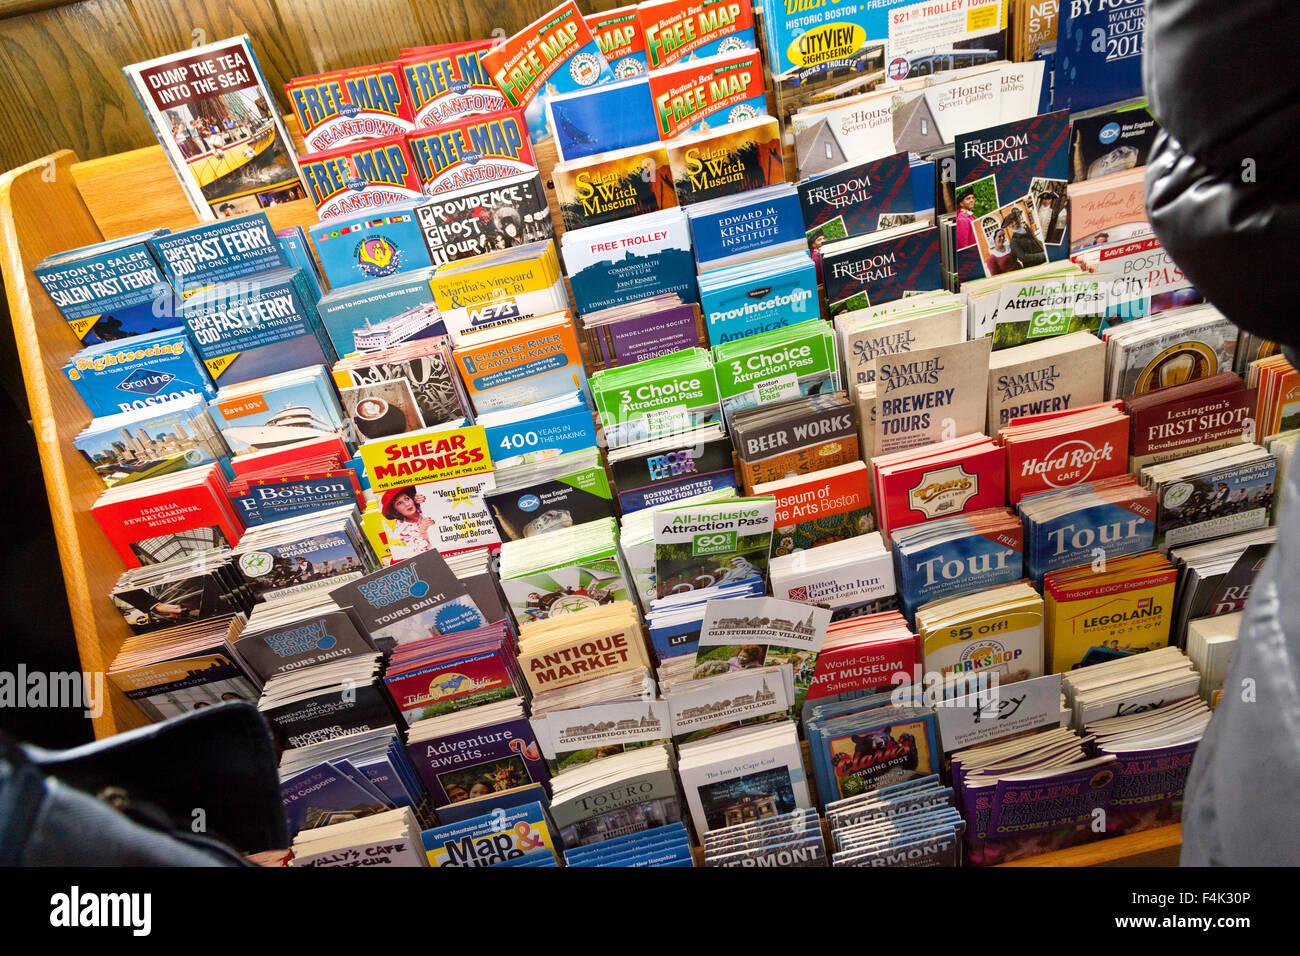 Turismo coloridos folletos para atracciones turísticas, Centro de Información Turística de Boston, Imagen De Stock